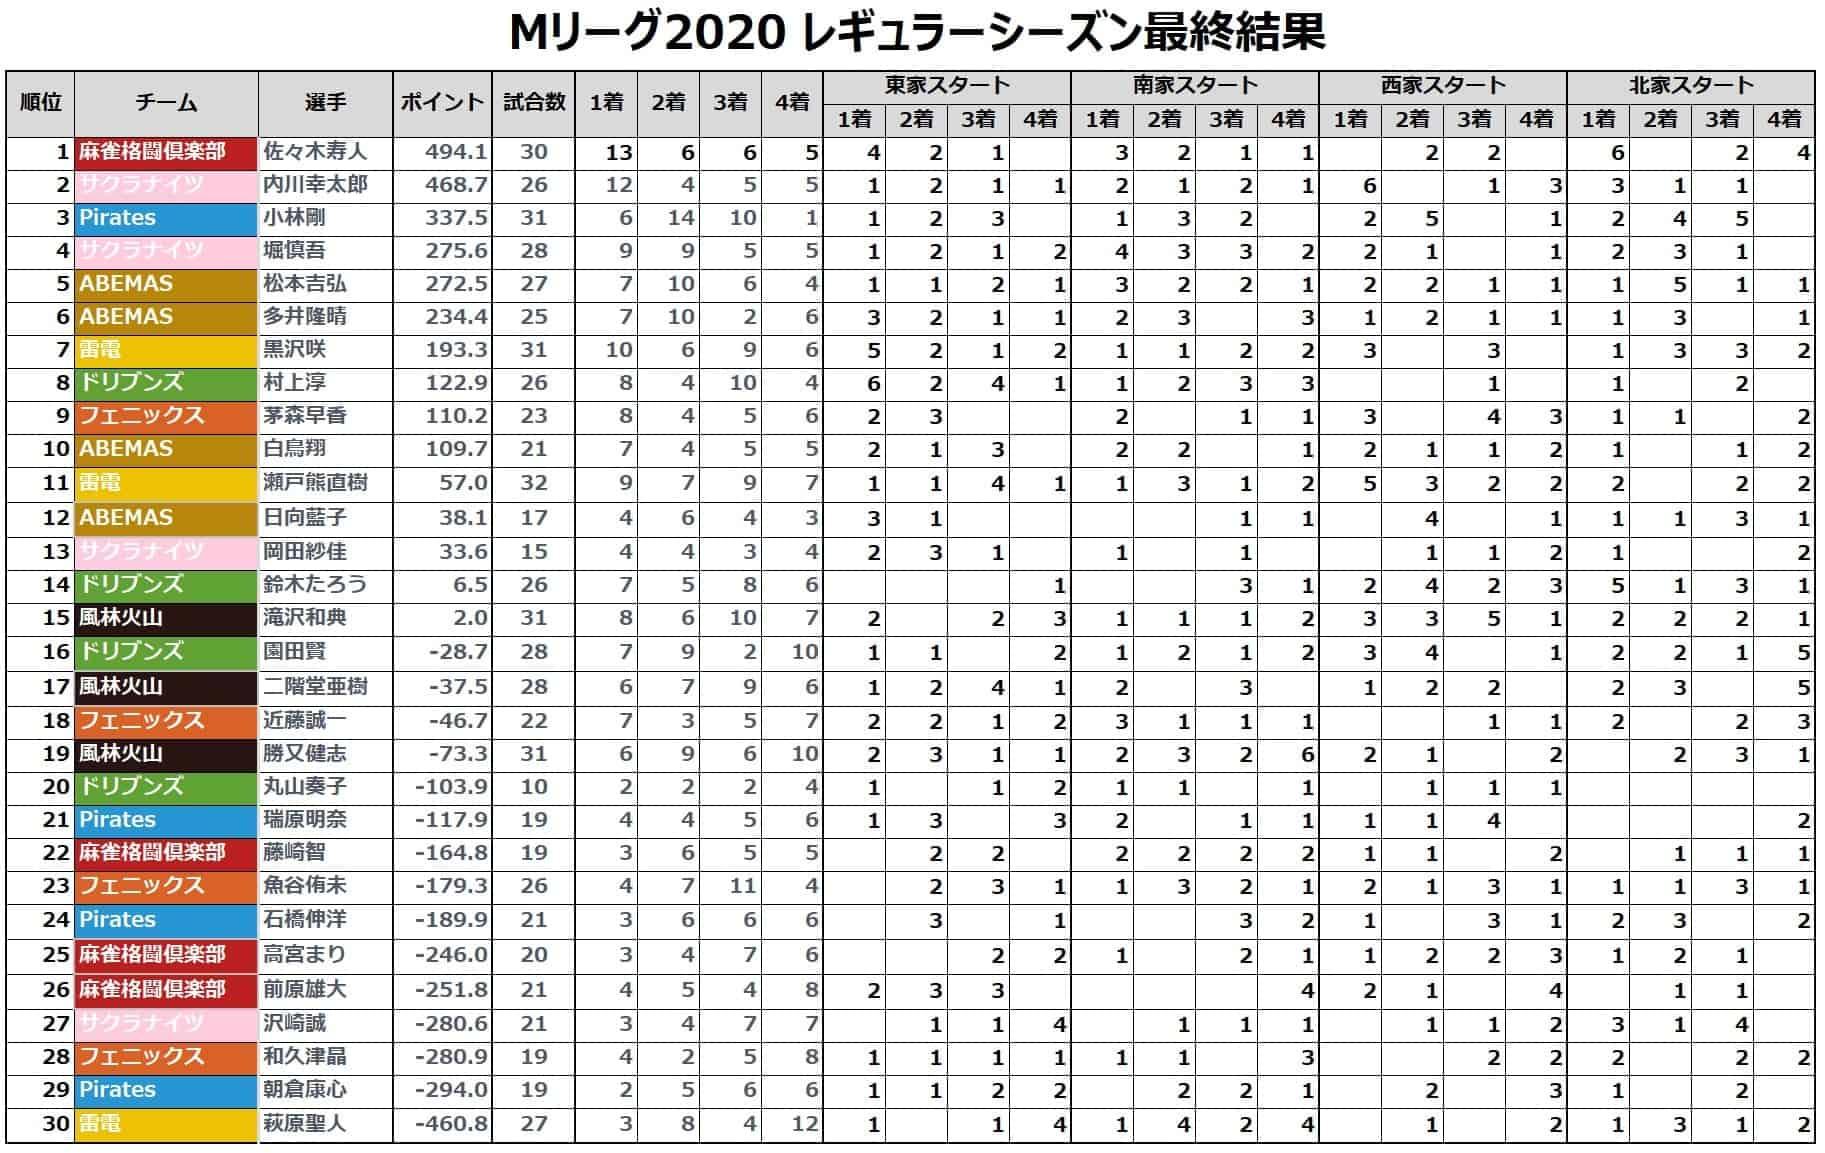 Mリーグ個人成績_着順(レギュラーシーズン最終結果)_20210312